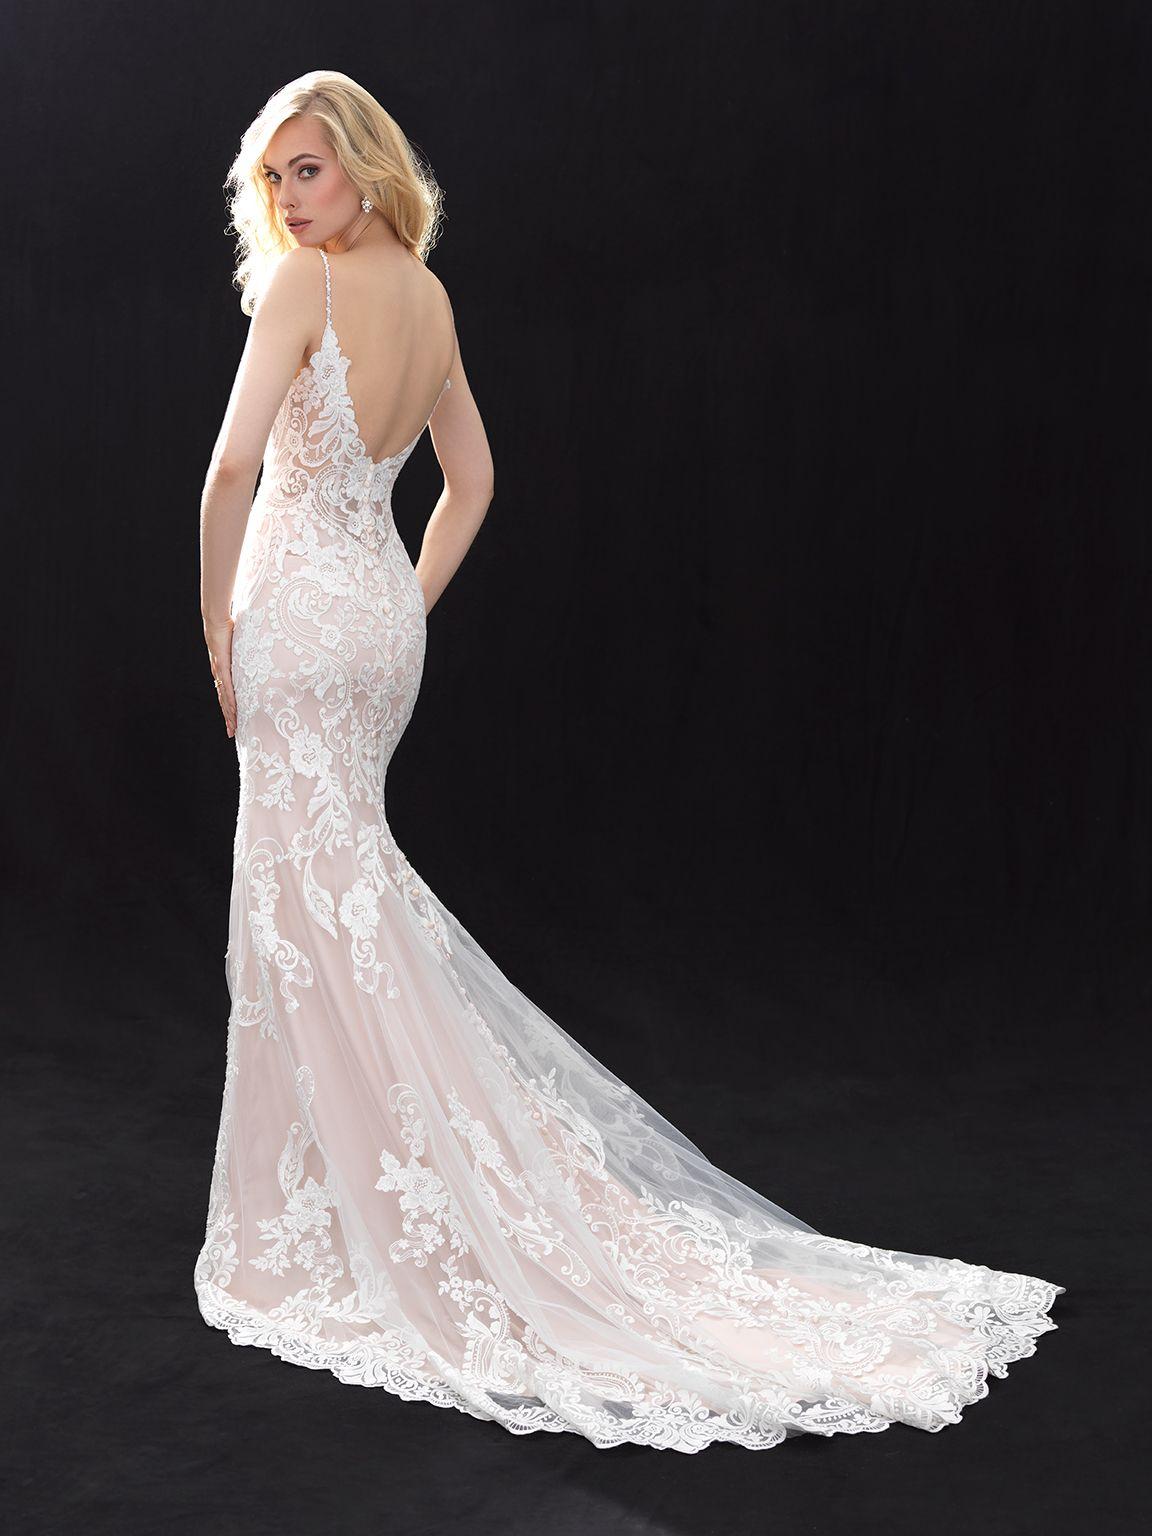 Allure Madison James MJ420 --- New York Bride & Groom {Charlotte ...